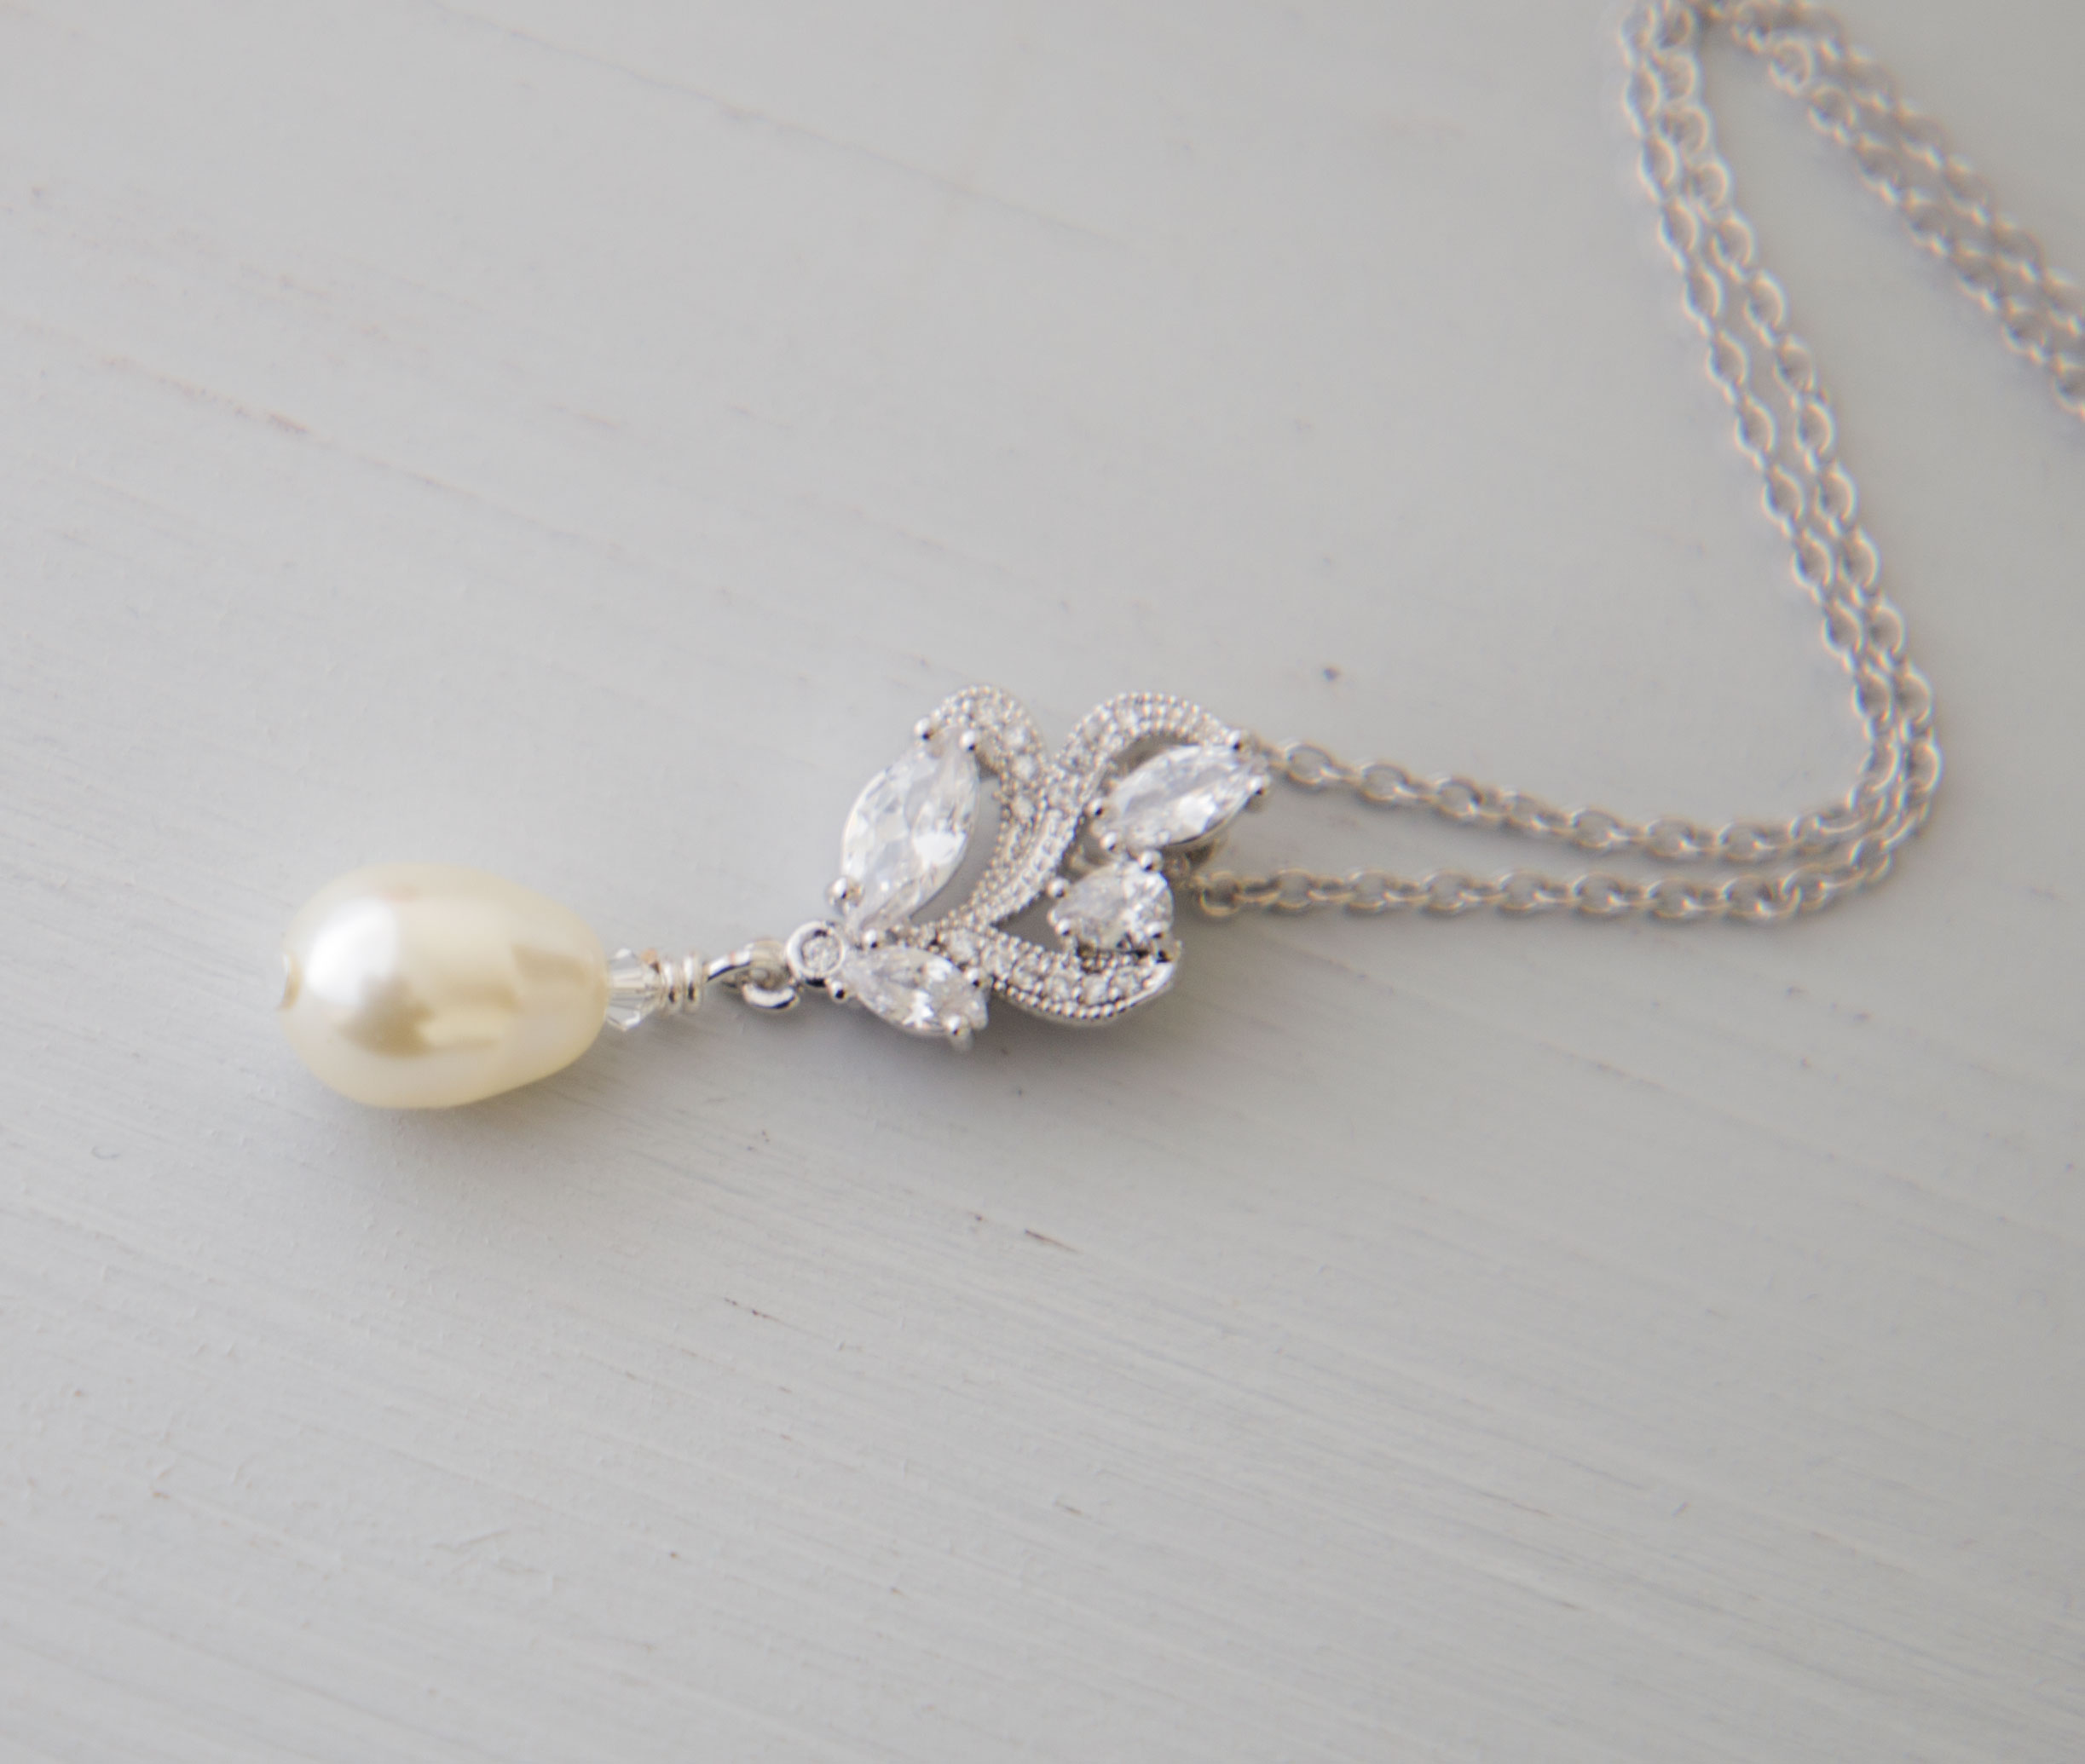 vendita calda autentica il migliore davvero economico Parure mariage boucles d'oreilles collier cristal perles